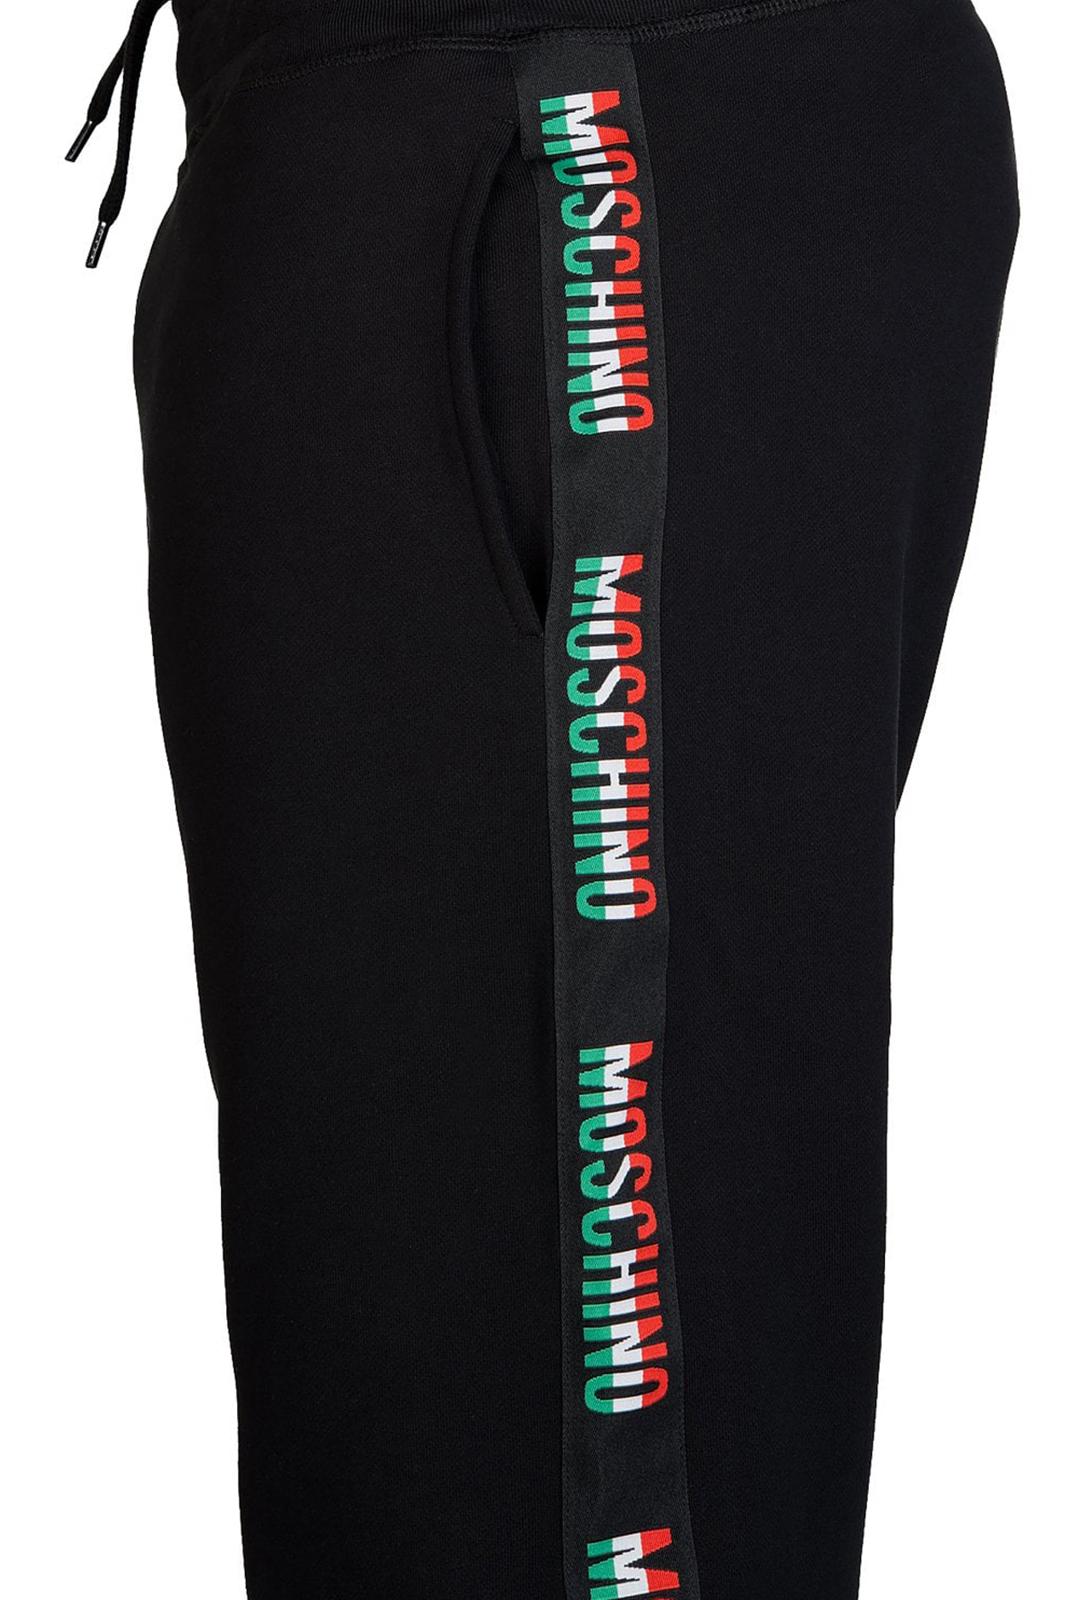 Pantalons  Moschino ZJO0323 1555 BLACK